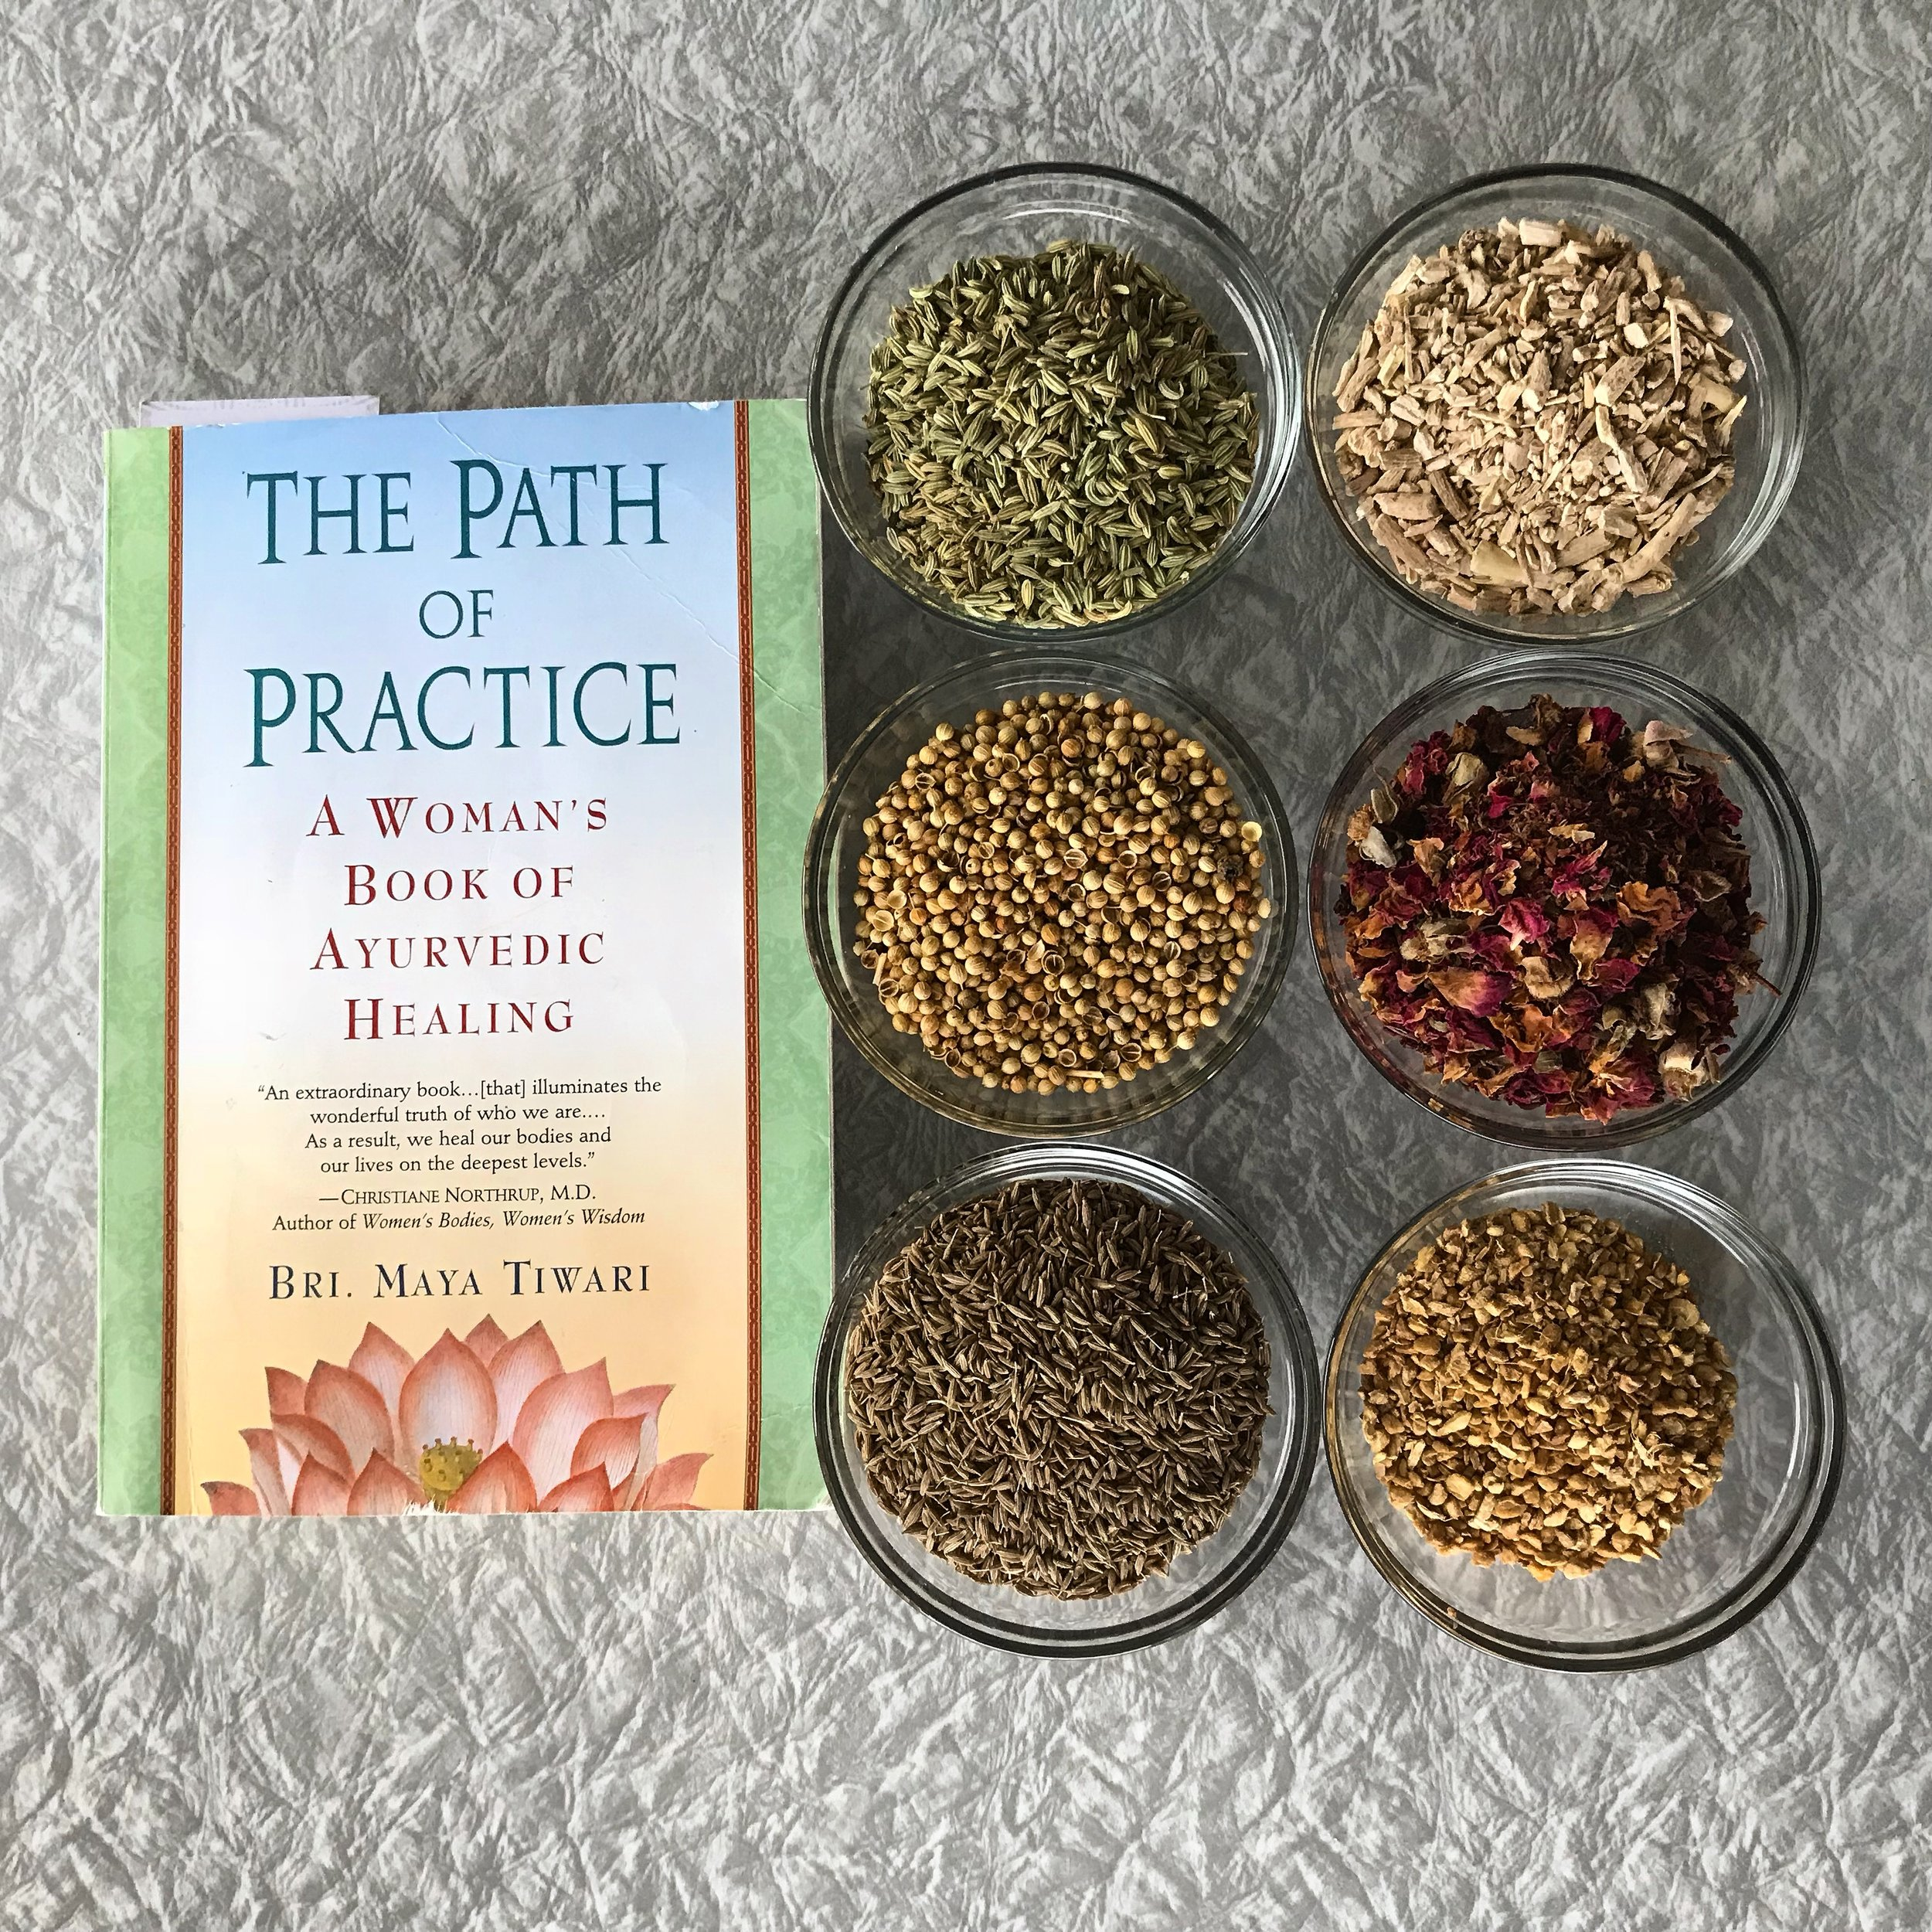 Five-Prana-Ayurveda_How-to-Develop-Positive-Habits.JPG